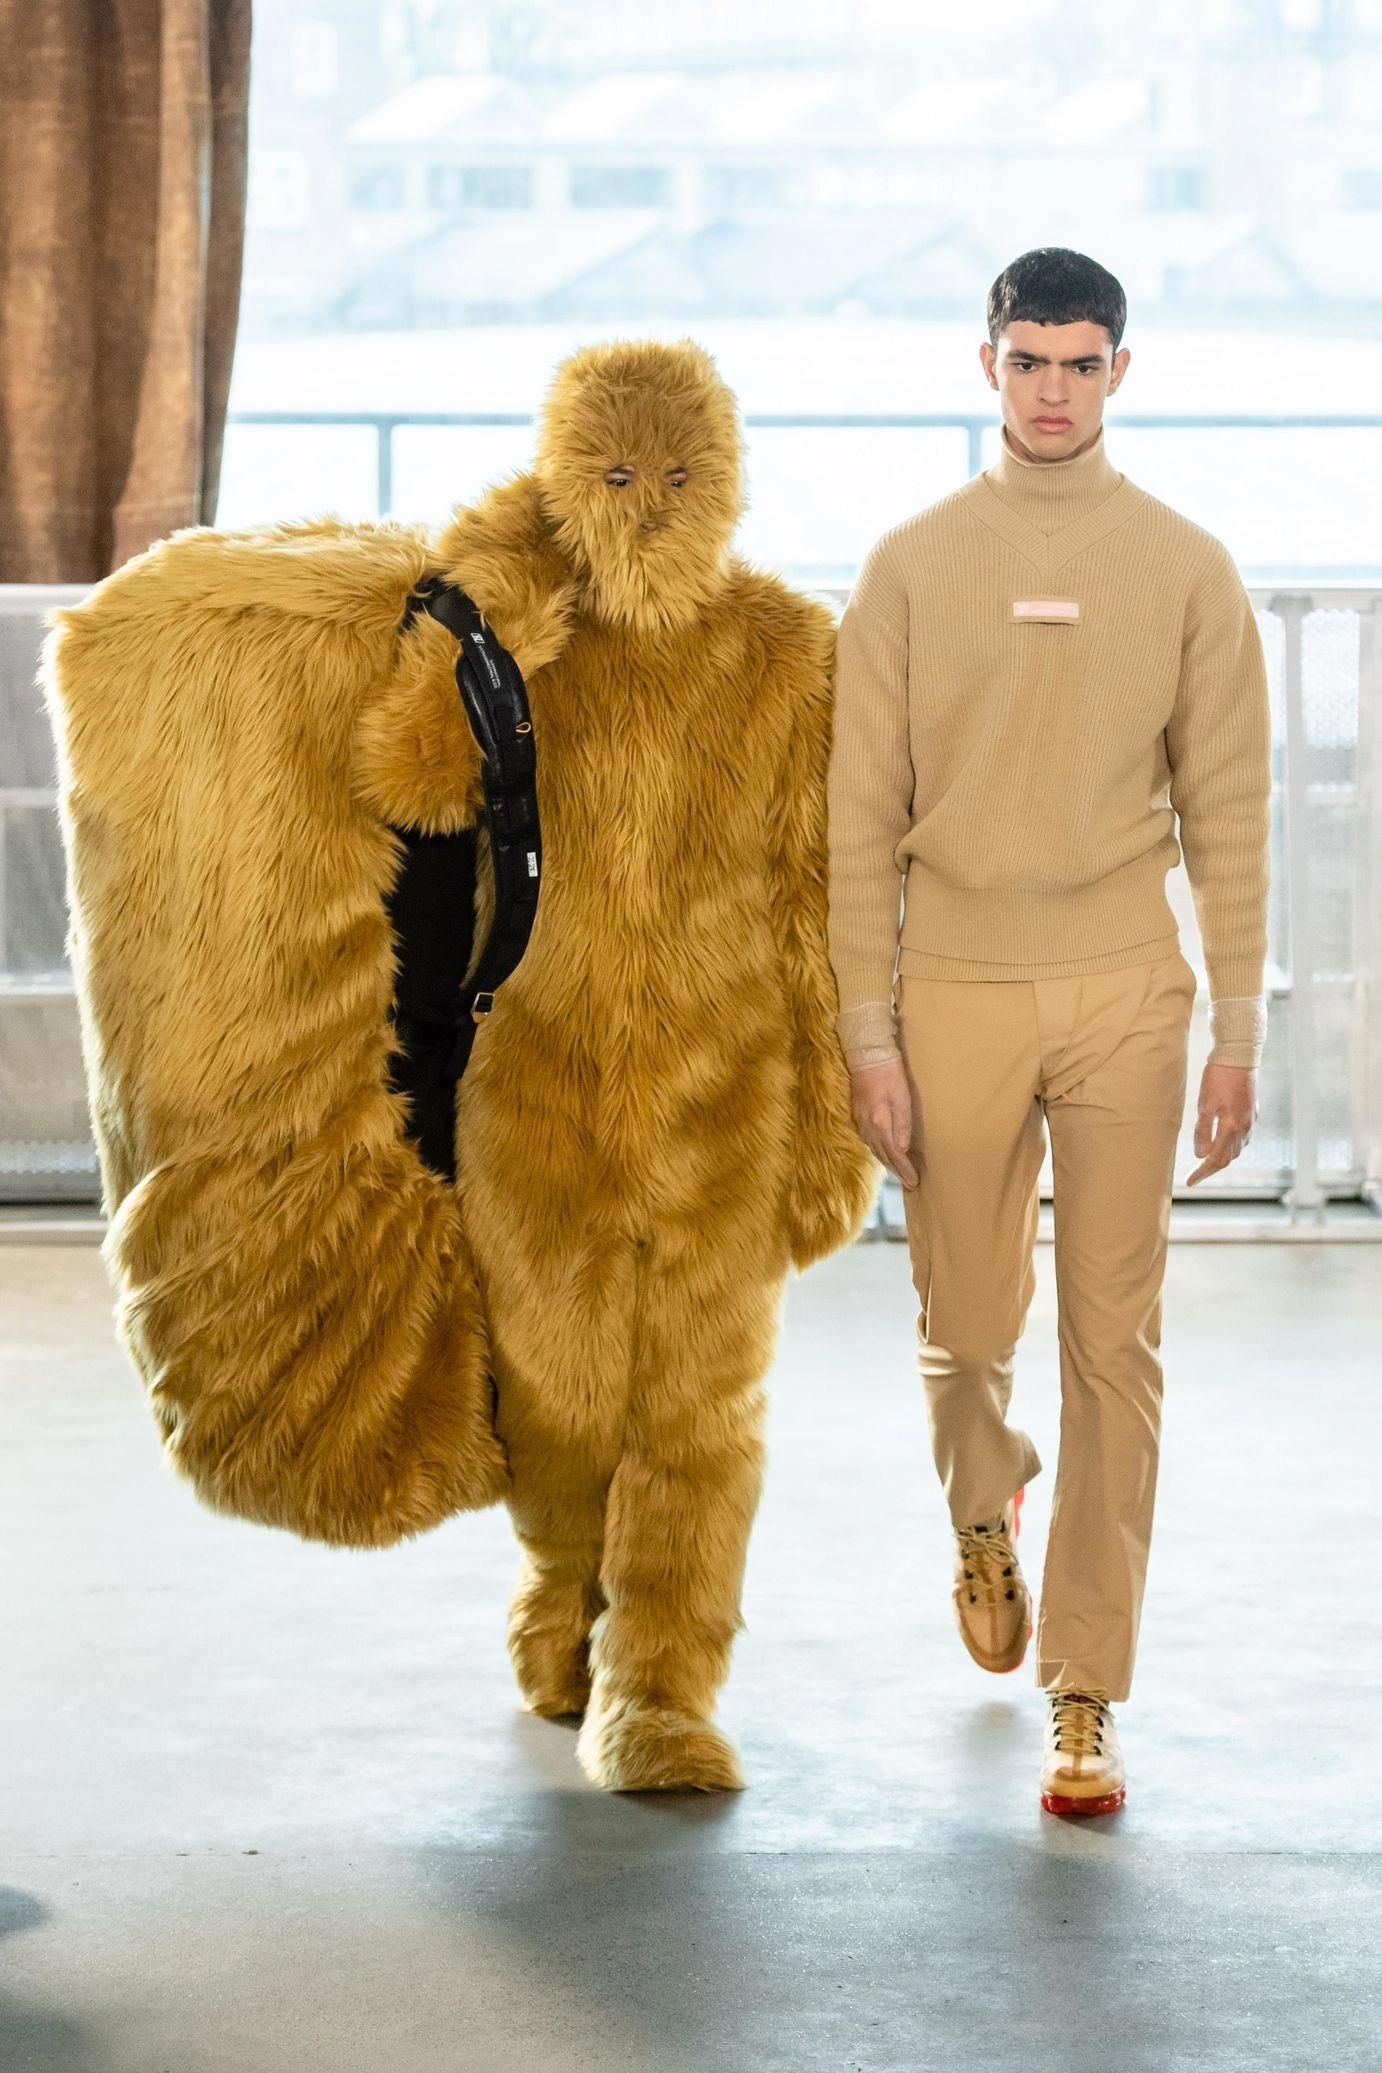 Mens Winter Fashion 2020.Xander Zhou Fall Winter 2019 2020 14 Mensfashionwinter